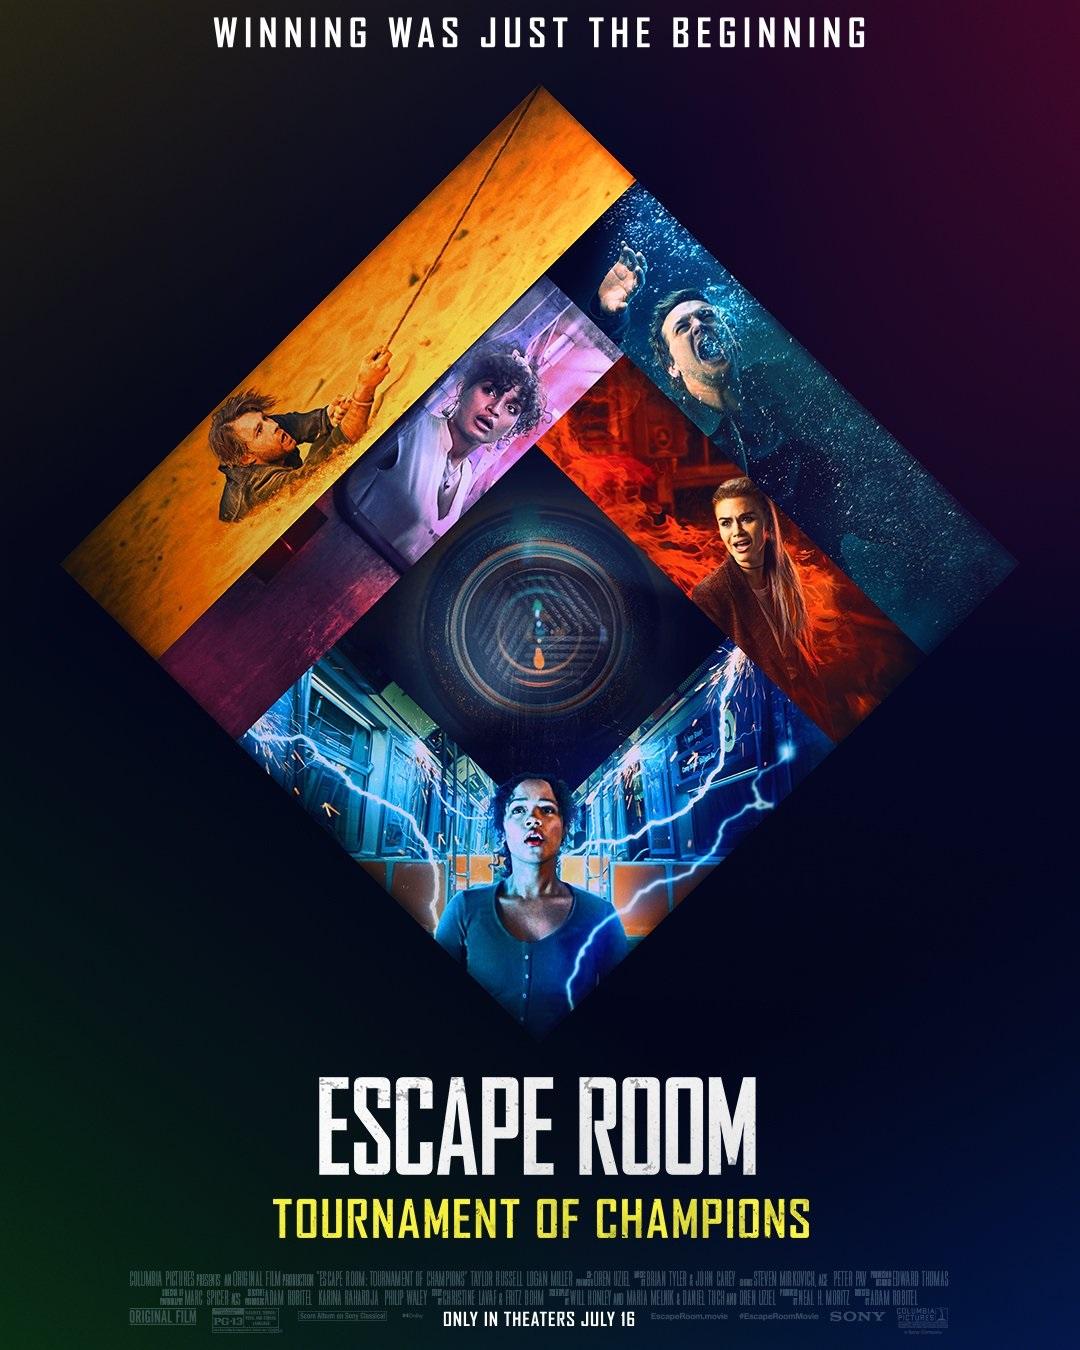 Summer of Cinema: Escape Room: Tournament of Champions